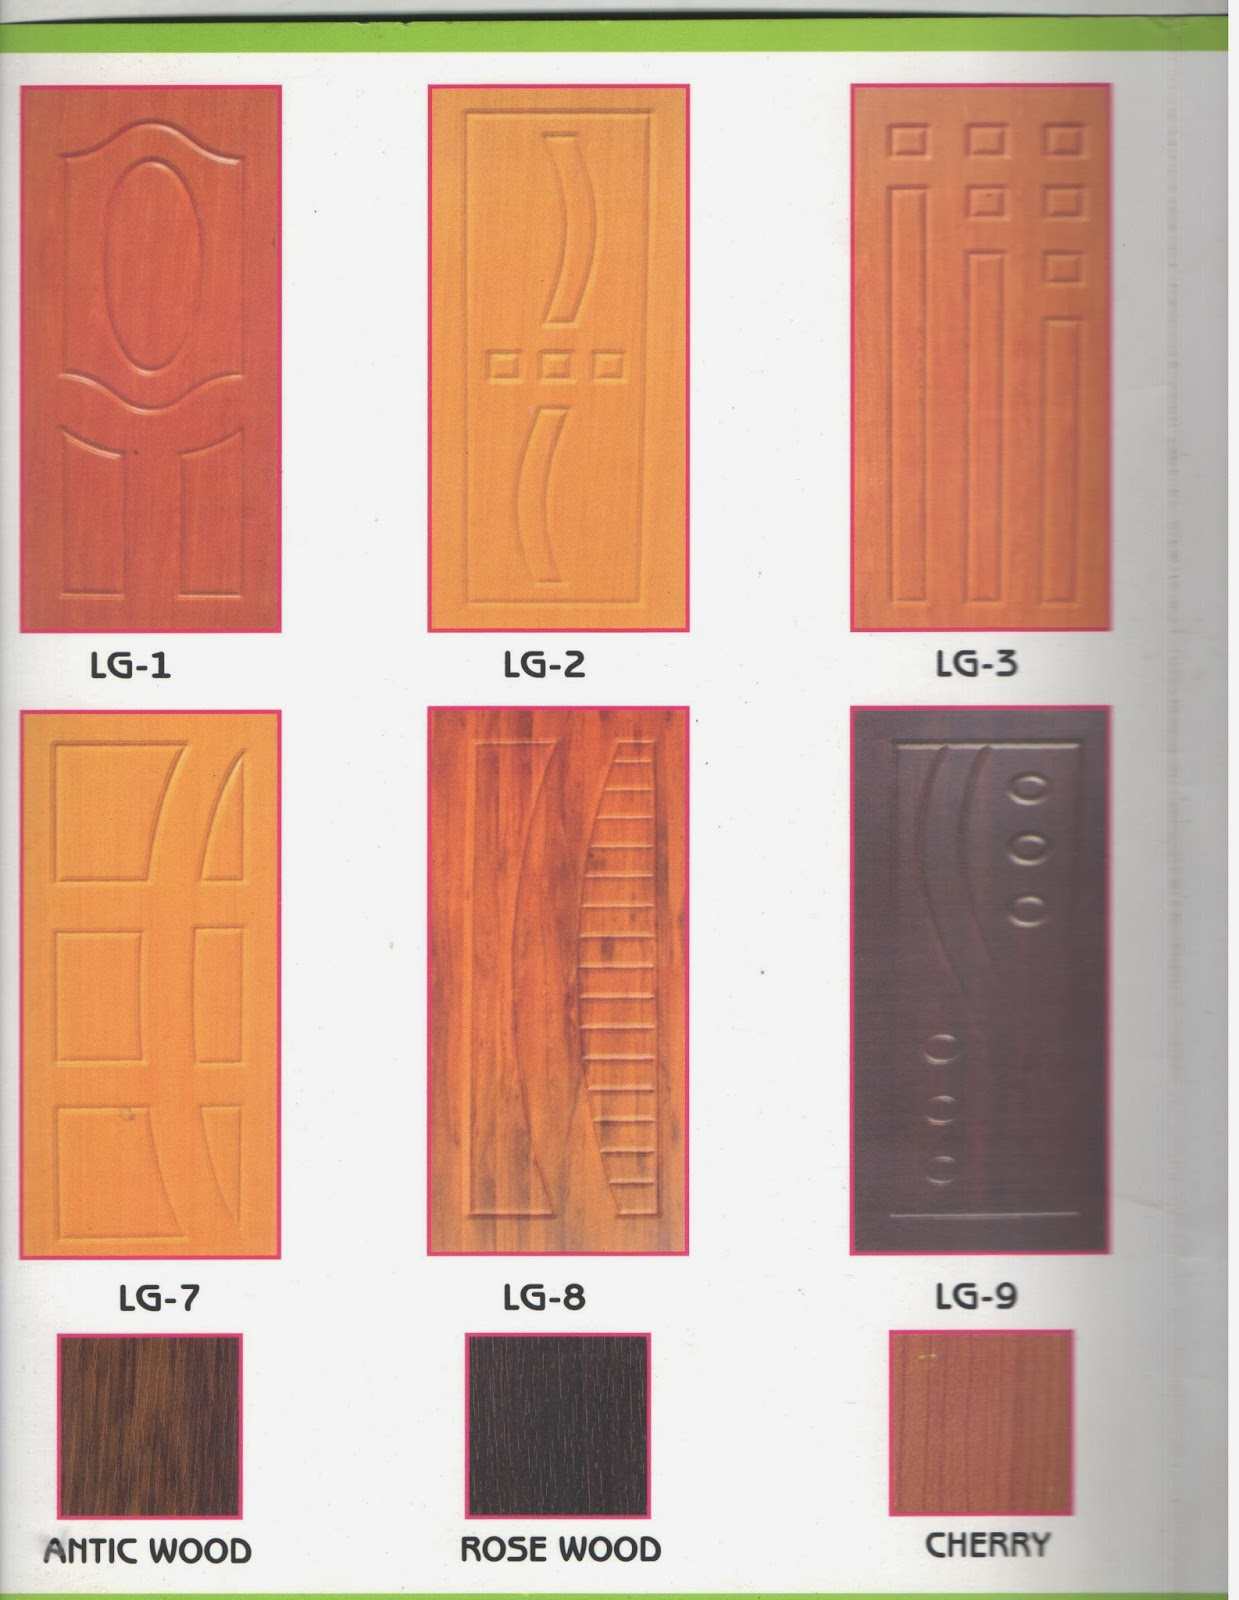 Radha Laminates u0026 Plywood  sc 1 st  Radha Laminates u0026 Plywood & Radha Laminates u0026 Plywood: PVC Routed Doors / Moulded Doors u0026 Door Skins